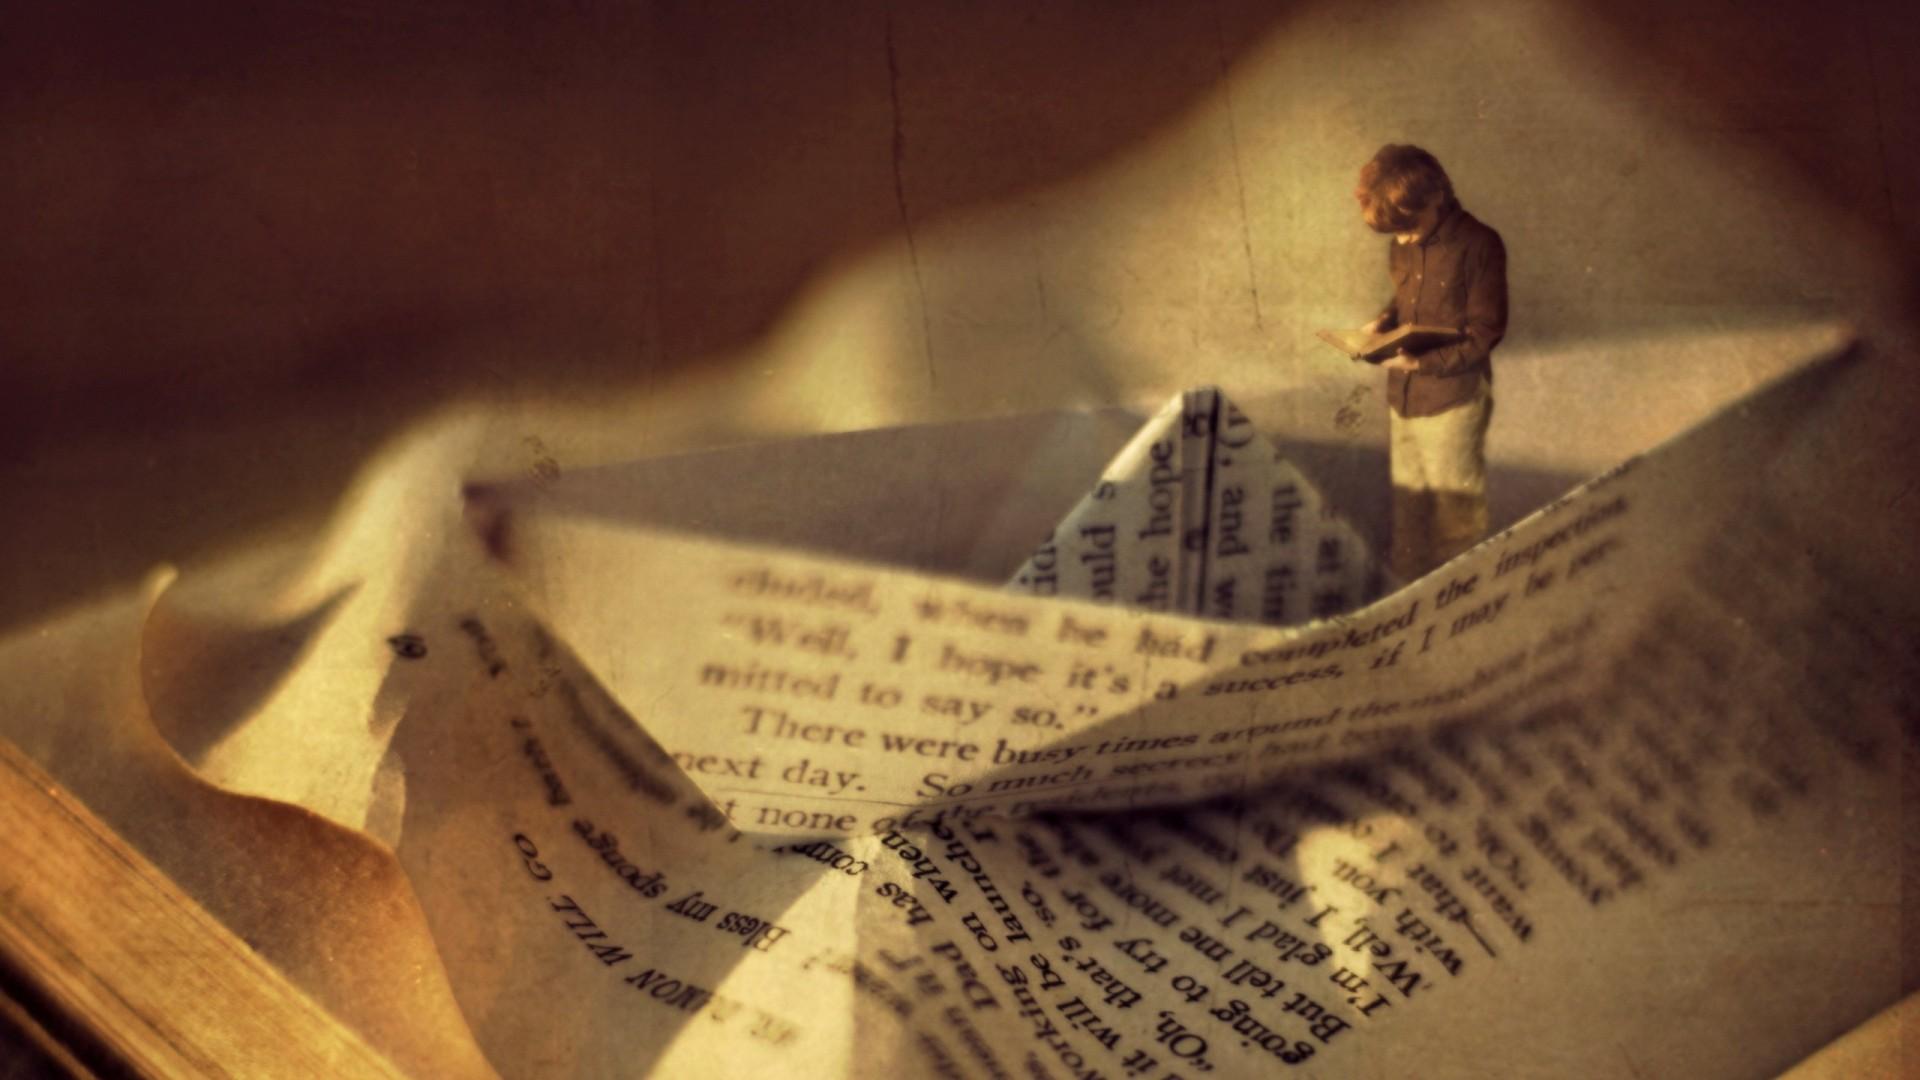 inspiring-boy-reading-book-in-a-boat-artistic-vintage-high-resolution-wallpaper-for-desktop-background